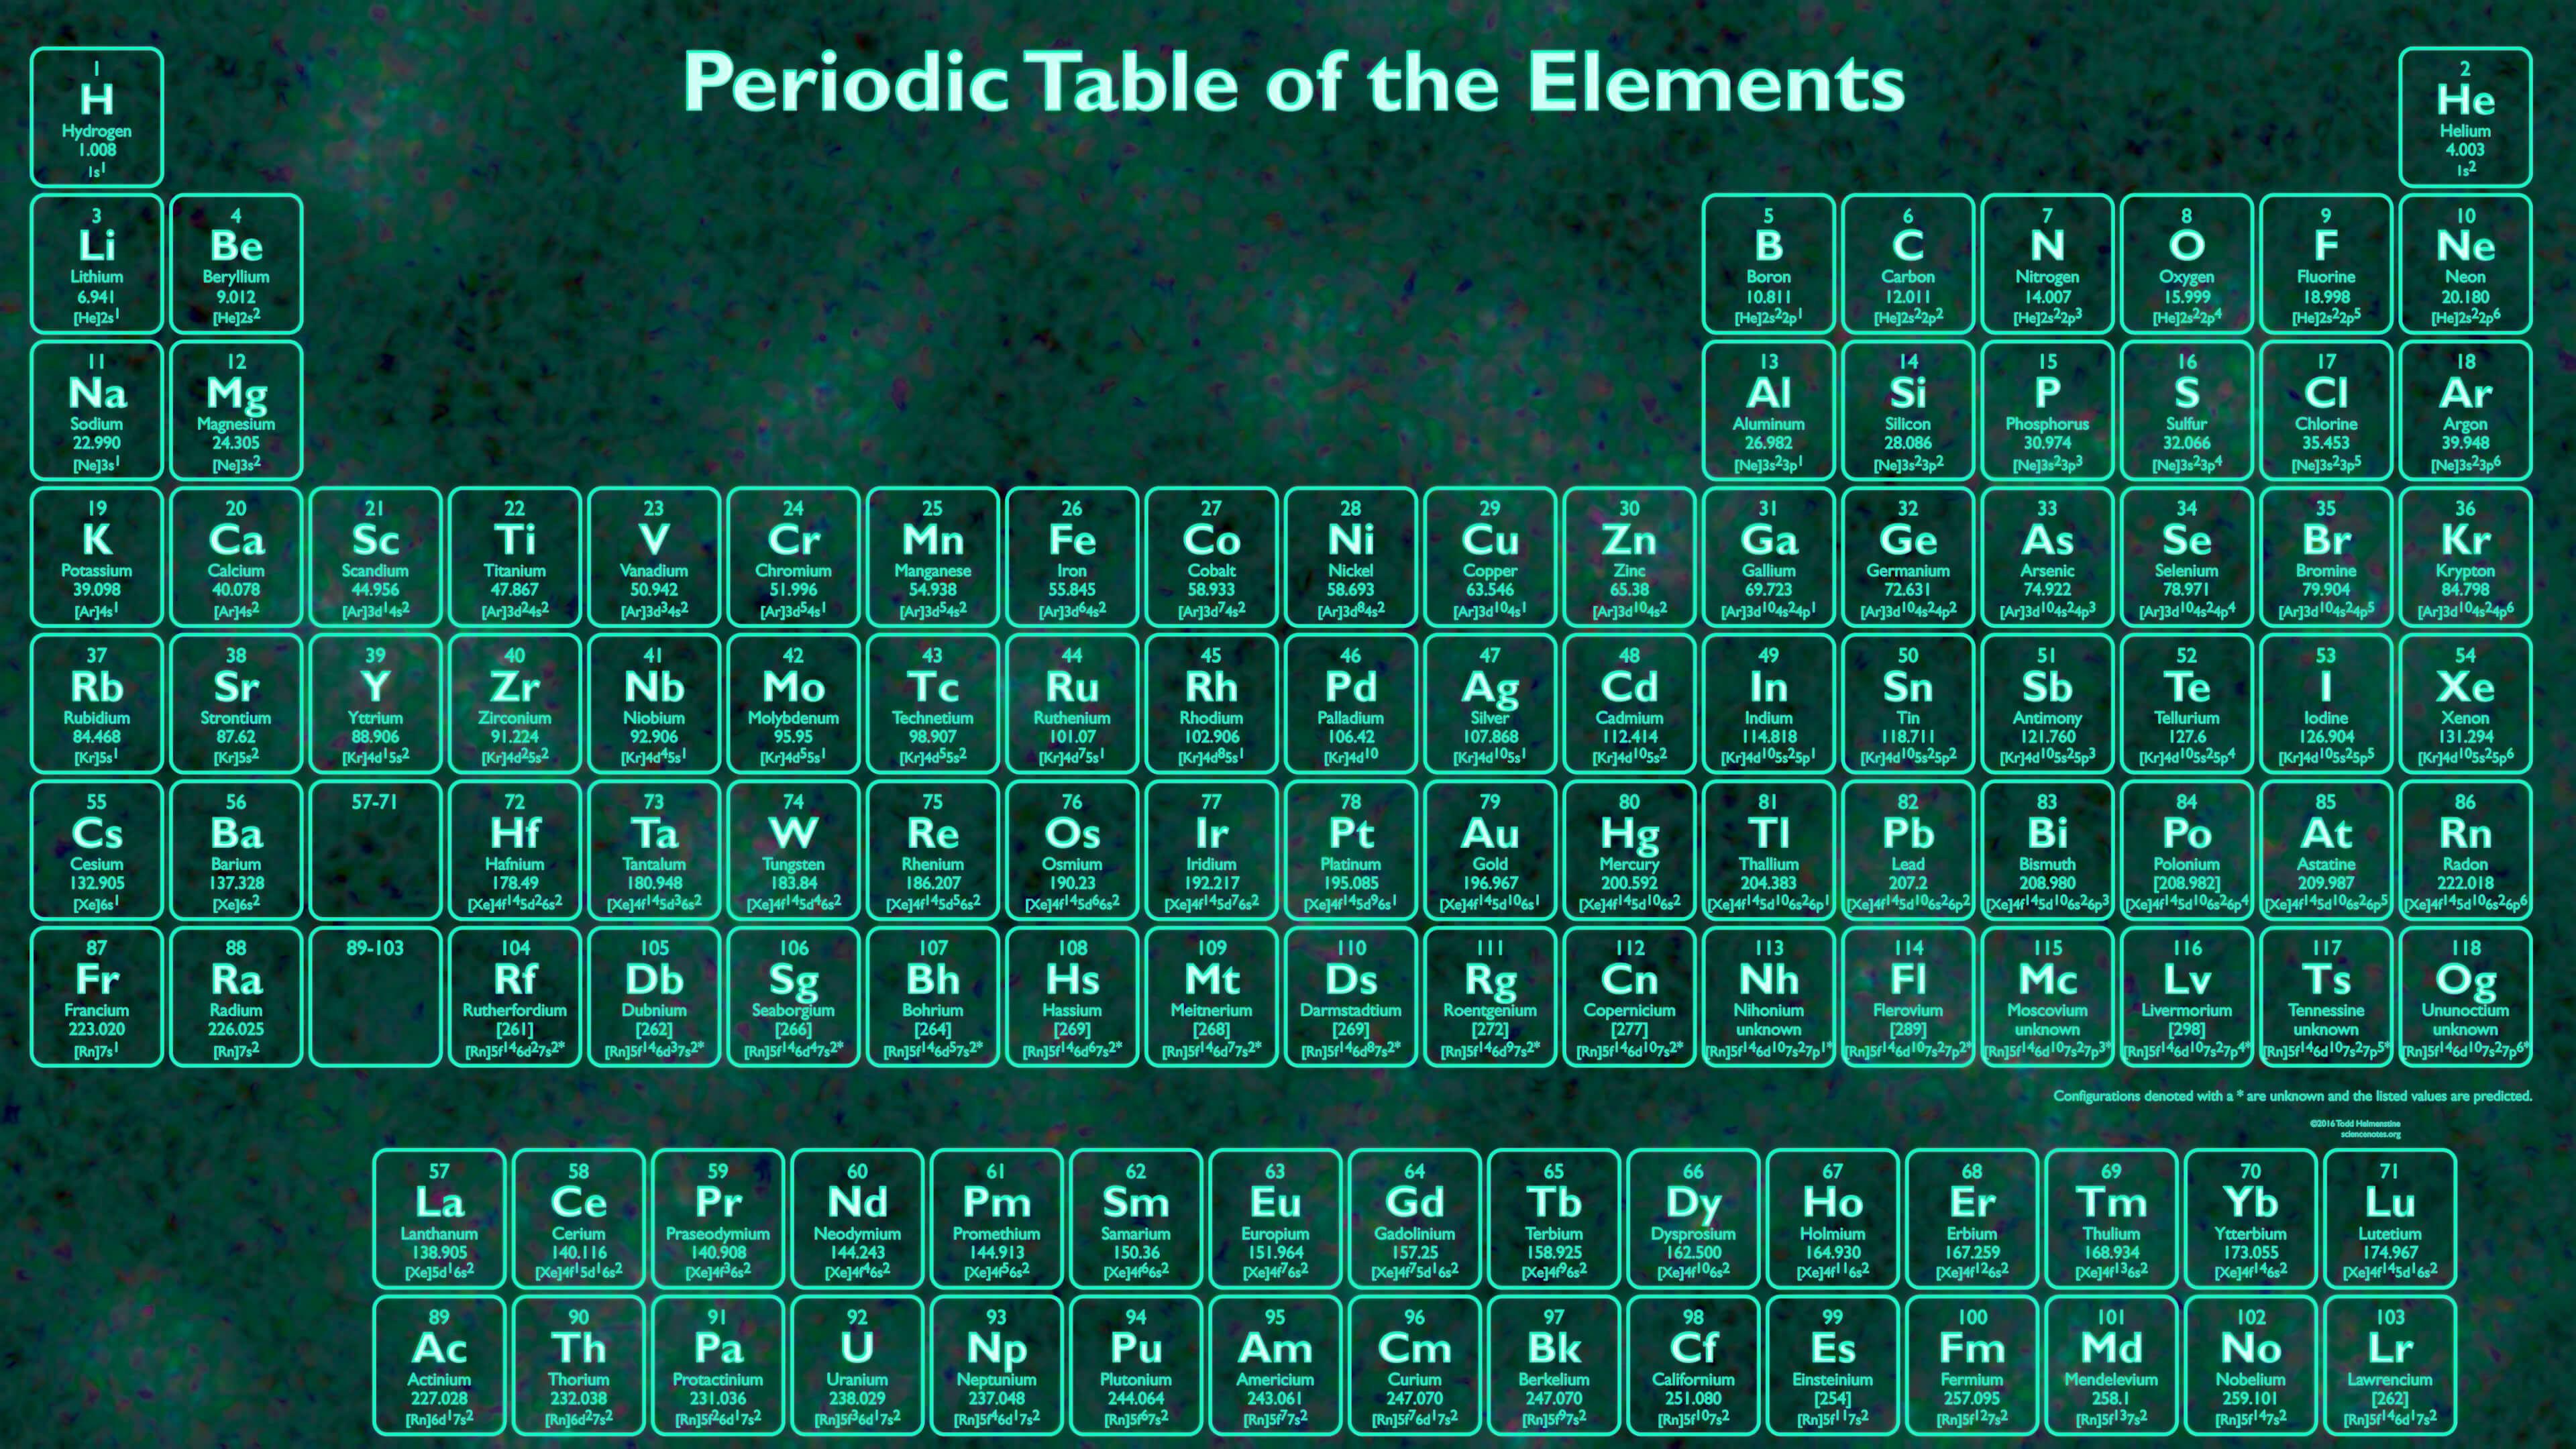 Hd periodic table wallpaper 70 images 1920x1080 custom hdq periodic table wallpapers and pictures 5943107 hd wallpapers download urtaz Choice Image